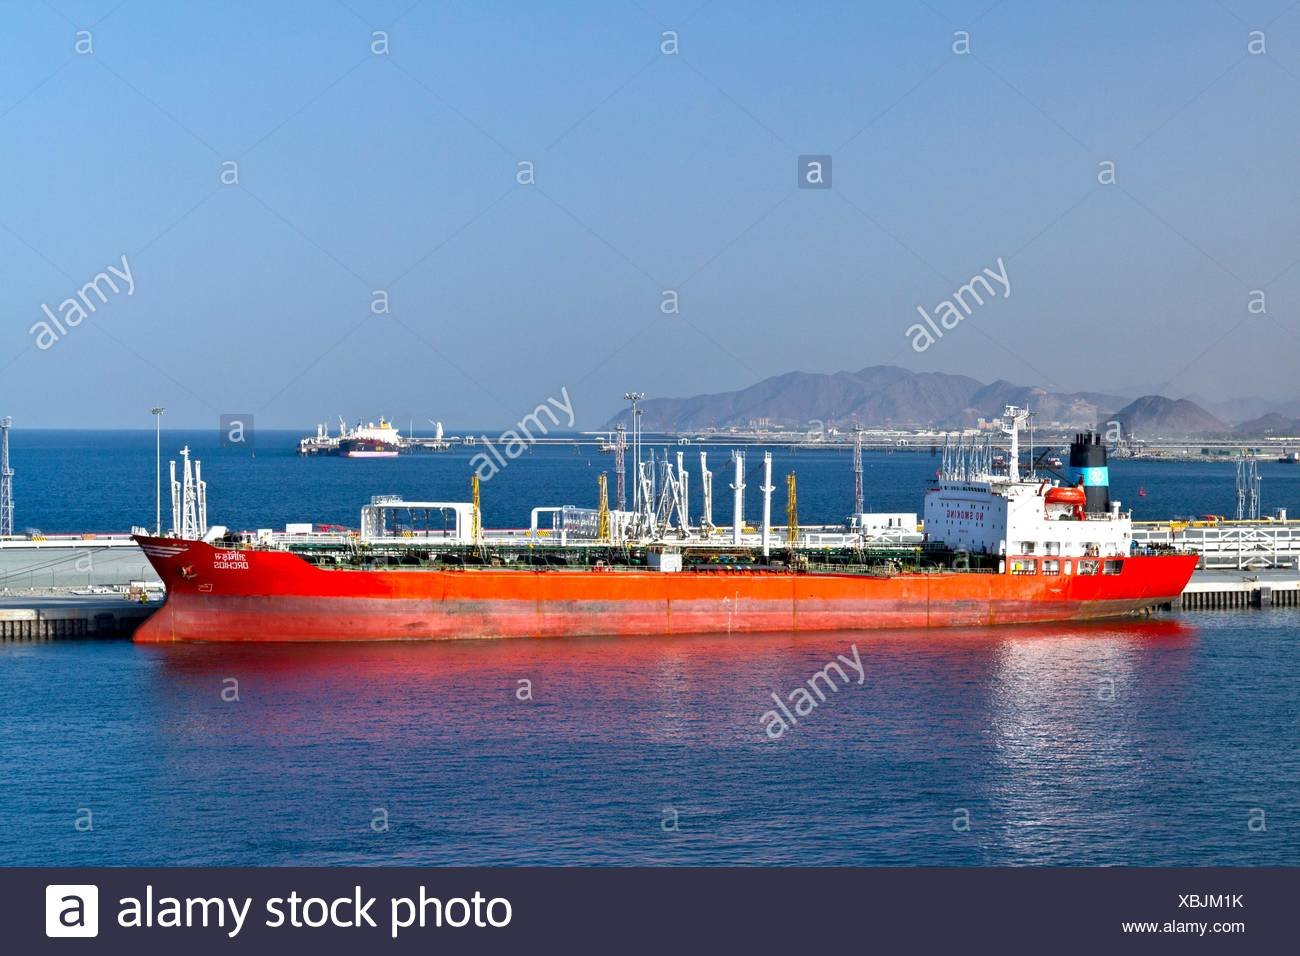 Oil tanker at an oil loading facility in Fujairah, UAE Stock Photo